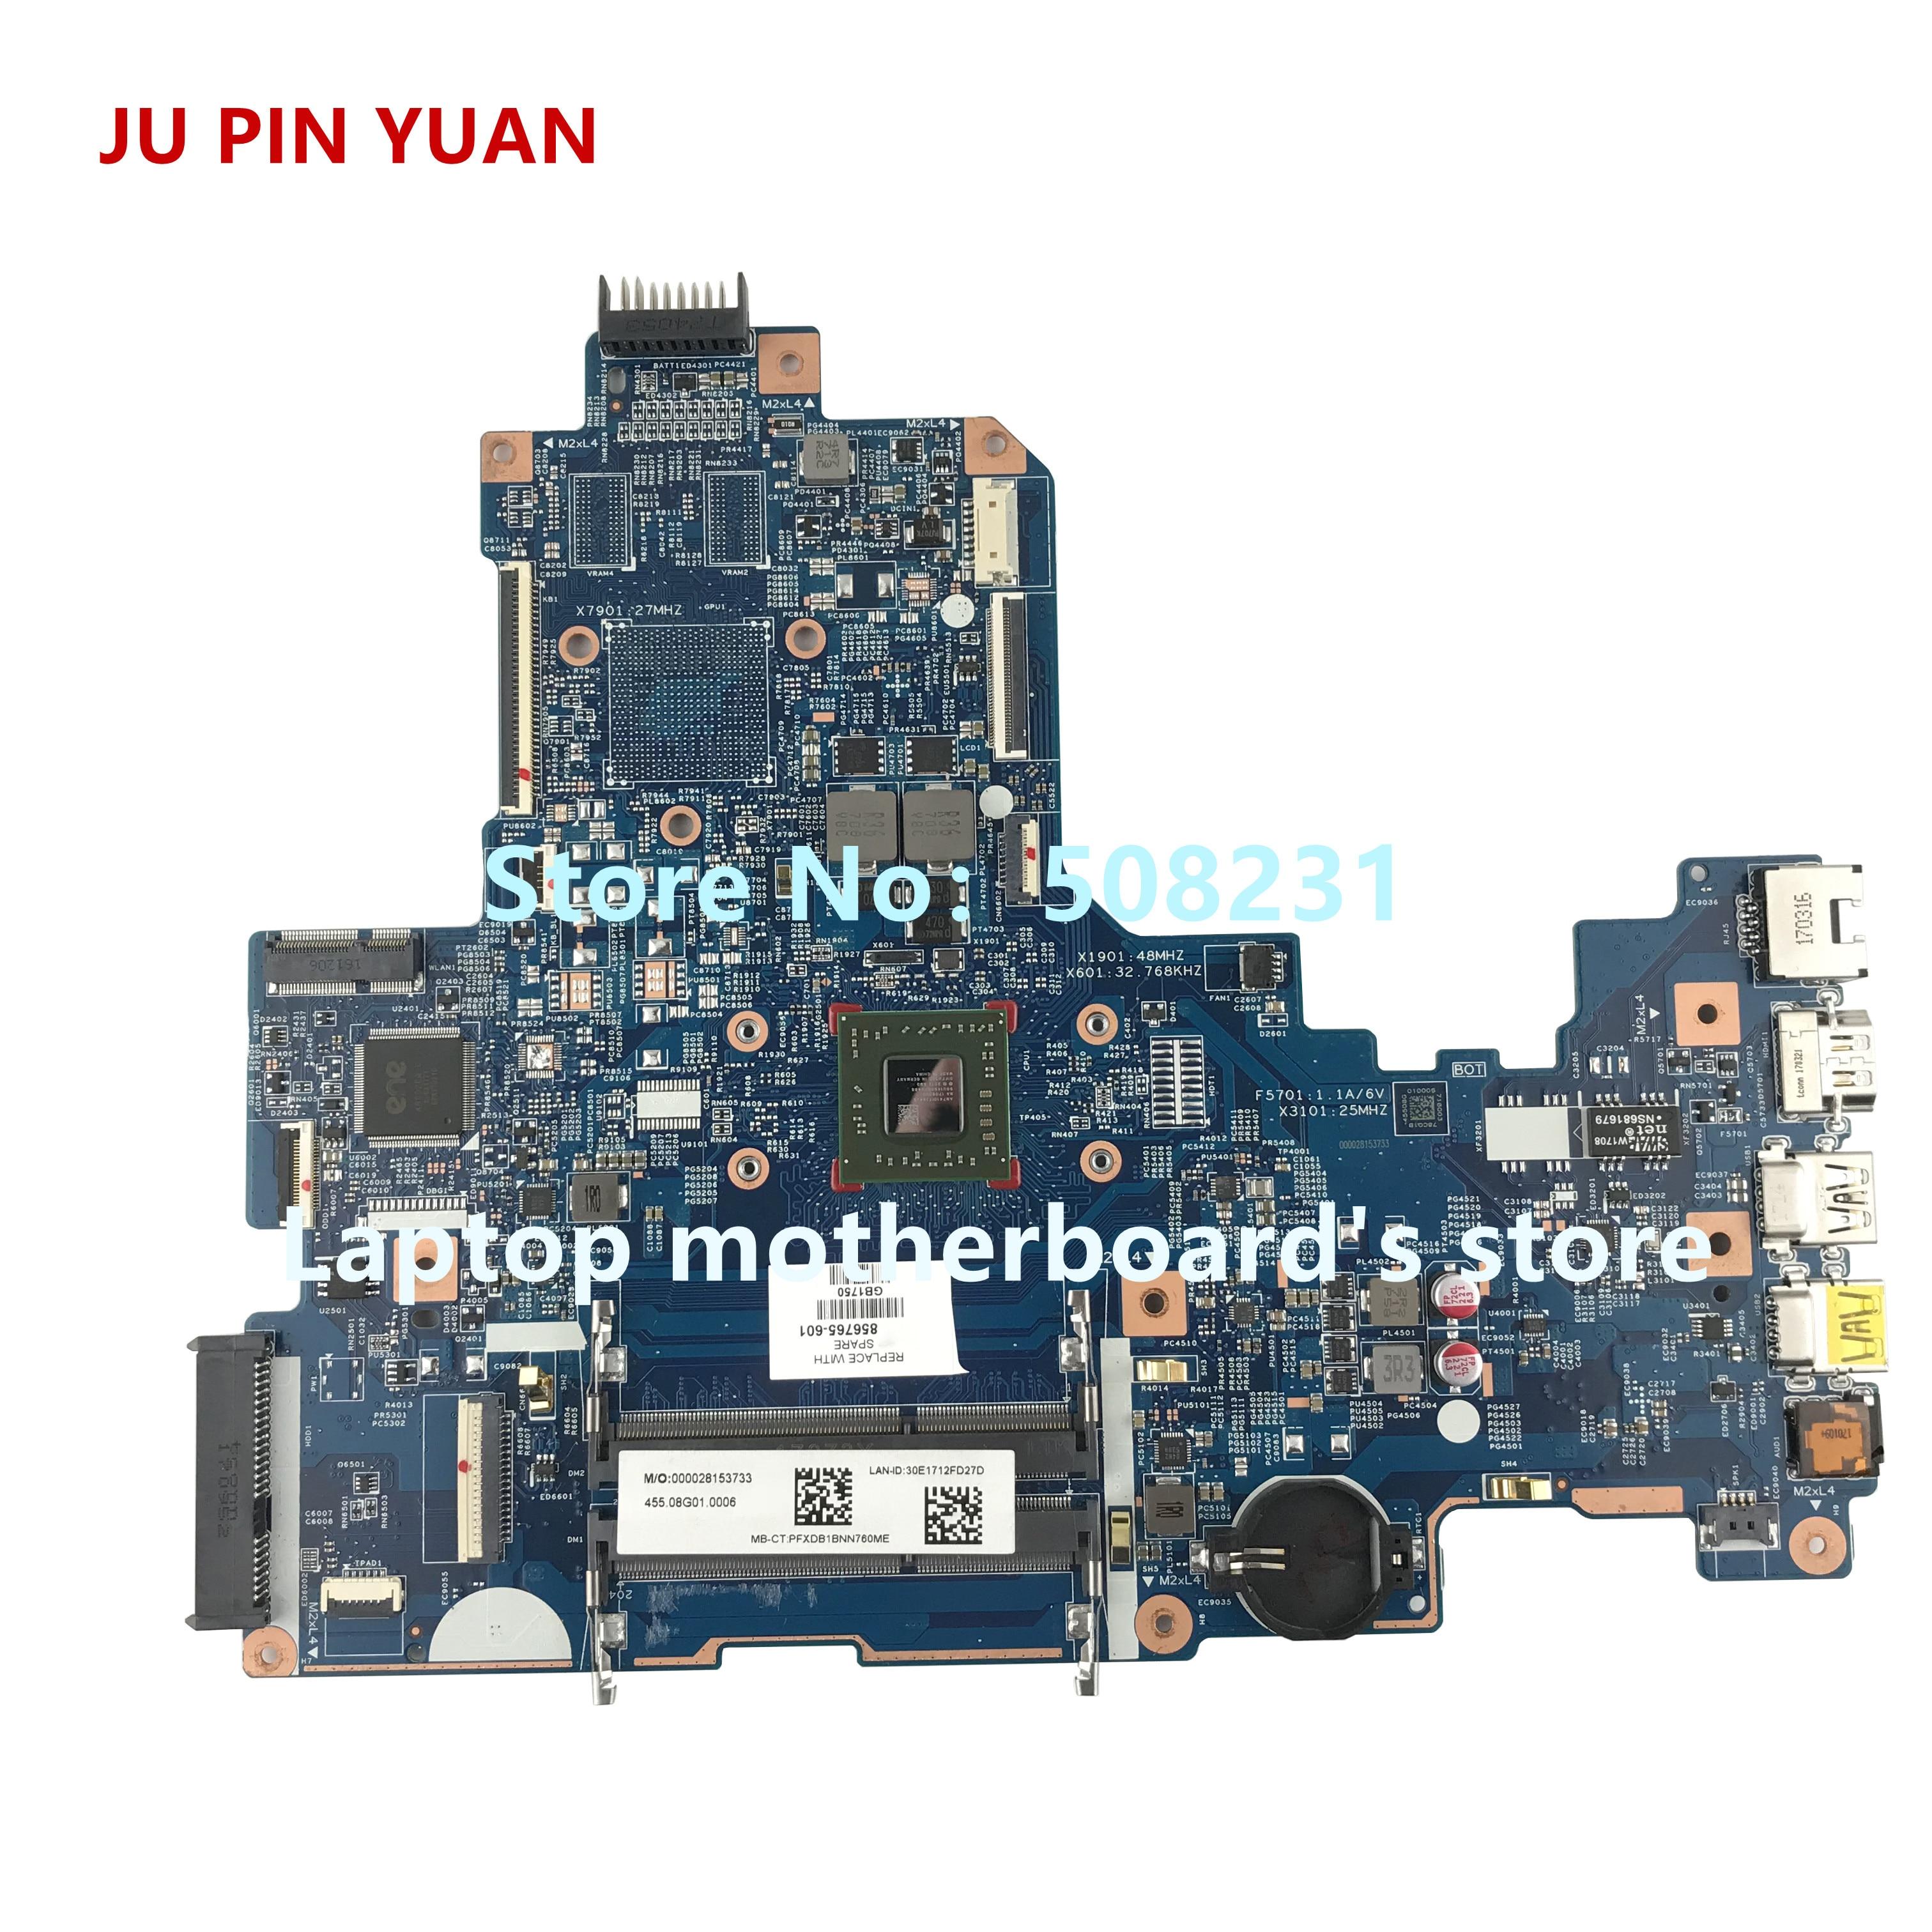 Ju pin yuan 856765 601 856765 001 аккумулятор большой емкости 448.08G03.0011 материнская плата для hp ноутбук 17 Y 17Z Y 17 Y088CL материнская плата портативного компьюте